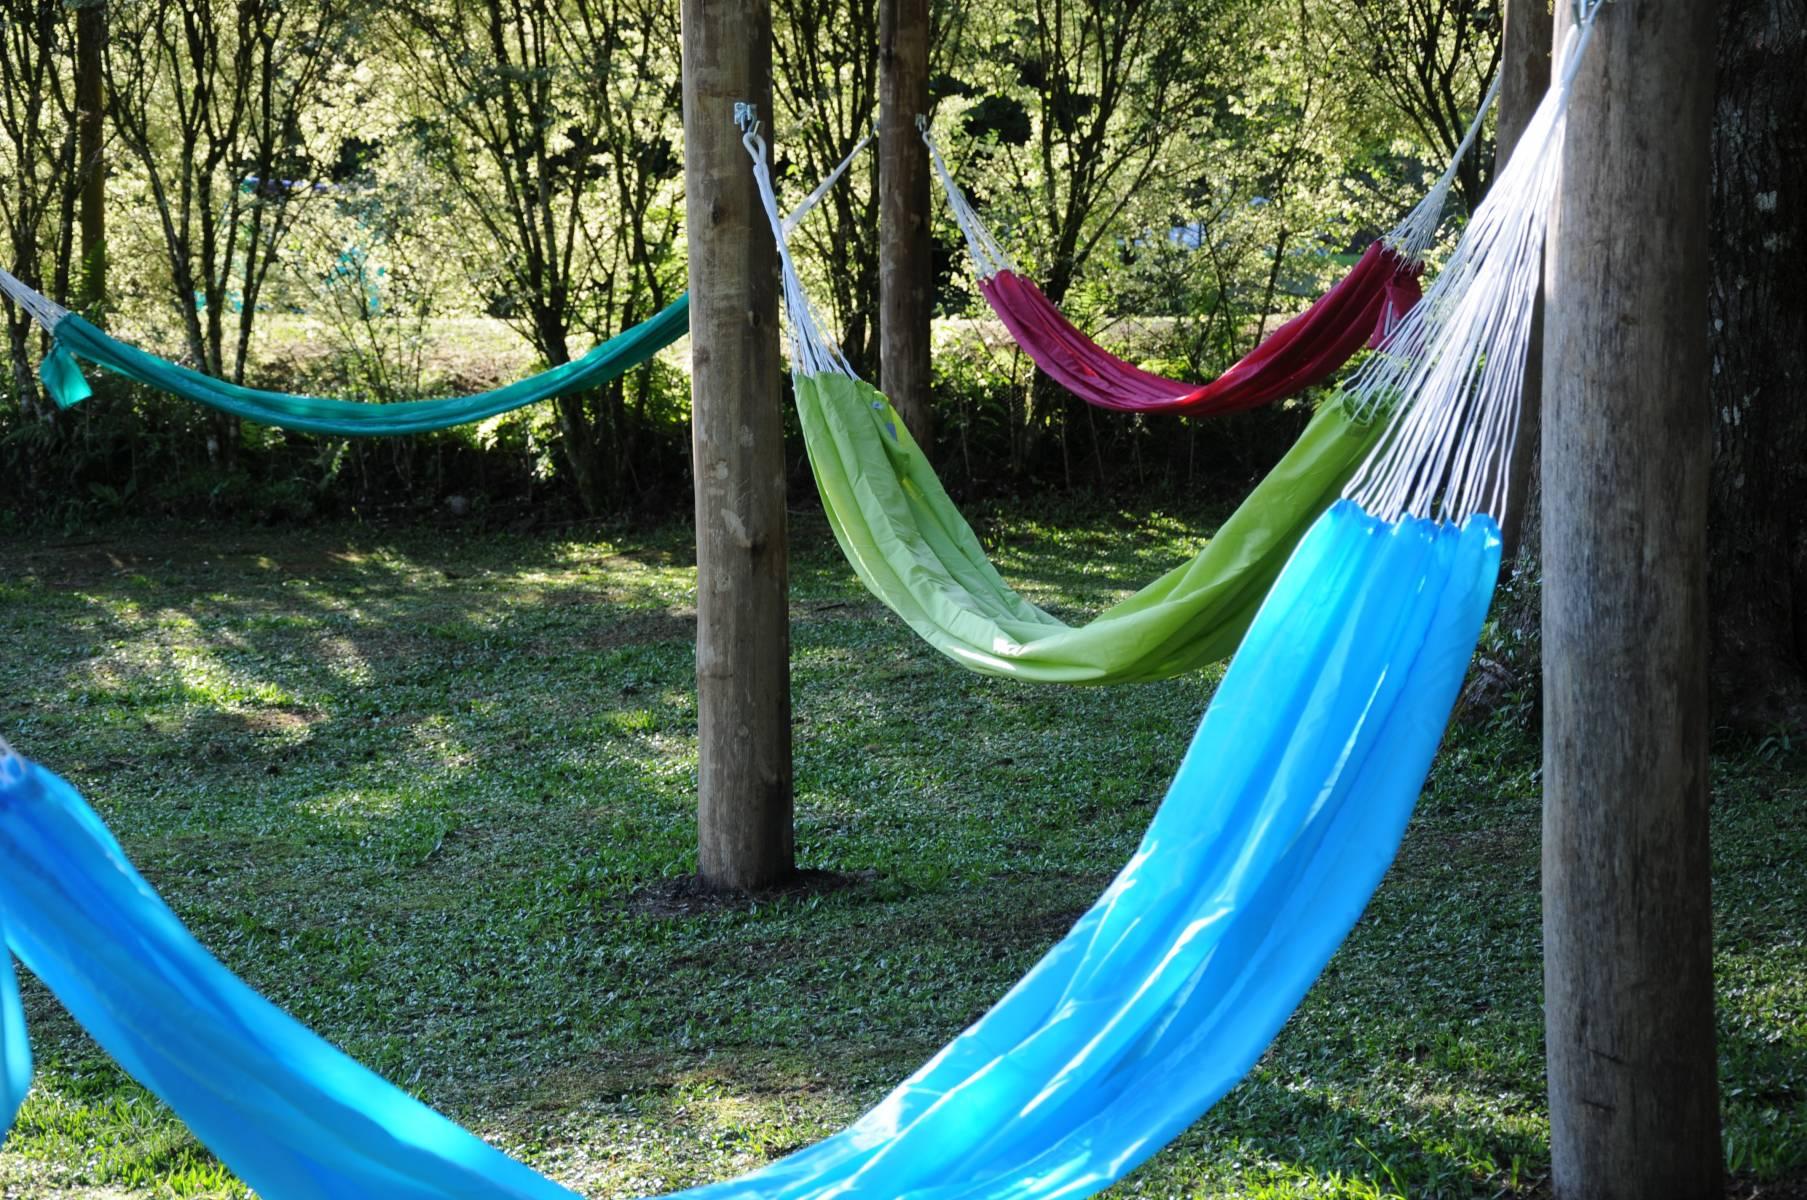 Redes - Hotel Bangalôs da Serra #CurtaSuaFamilia #HotelSustentavel #TurismoVerde #TravelersChoice #EcoLider #Gramado